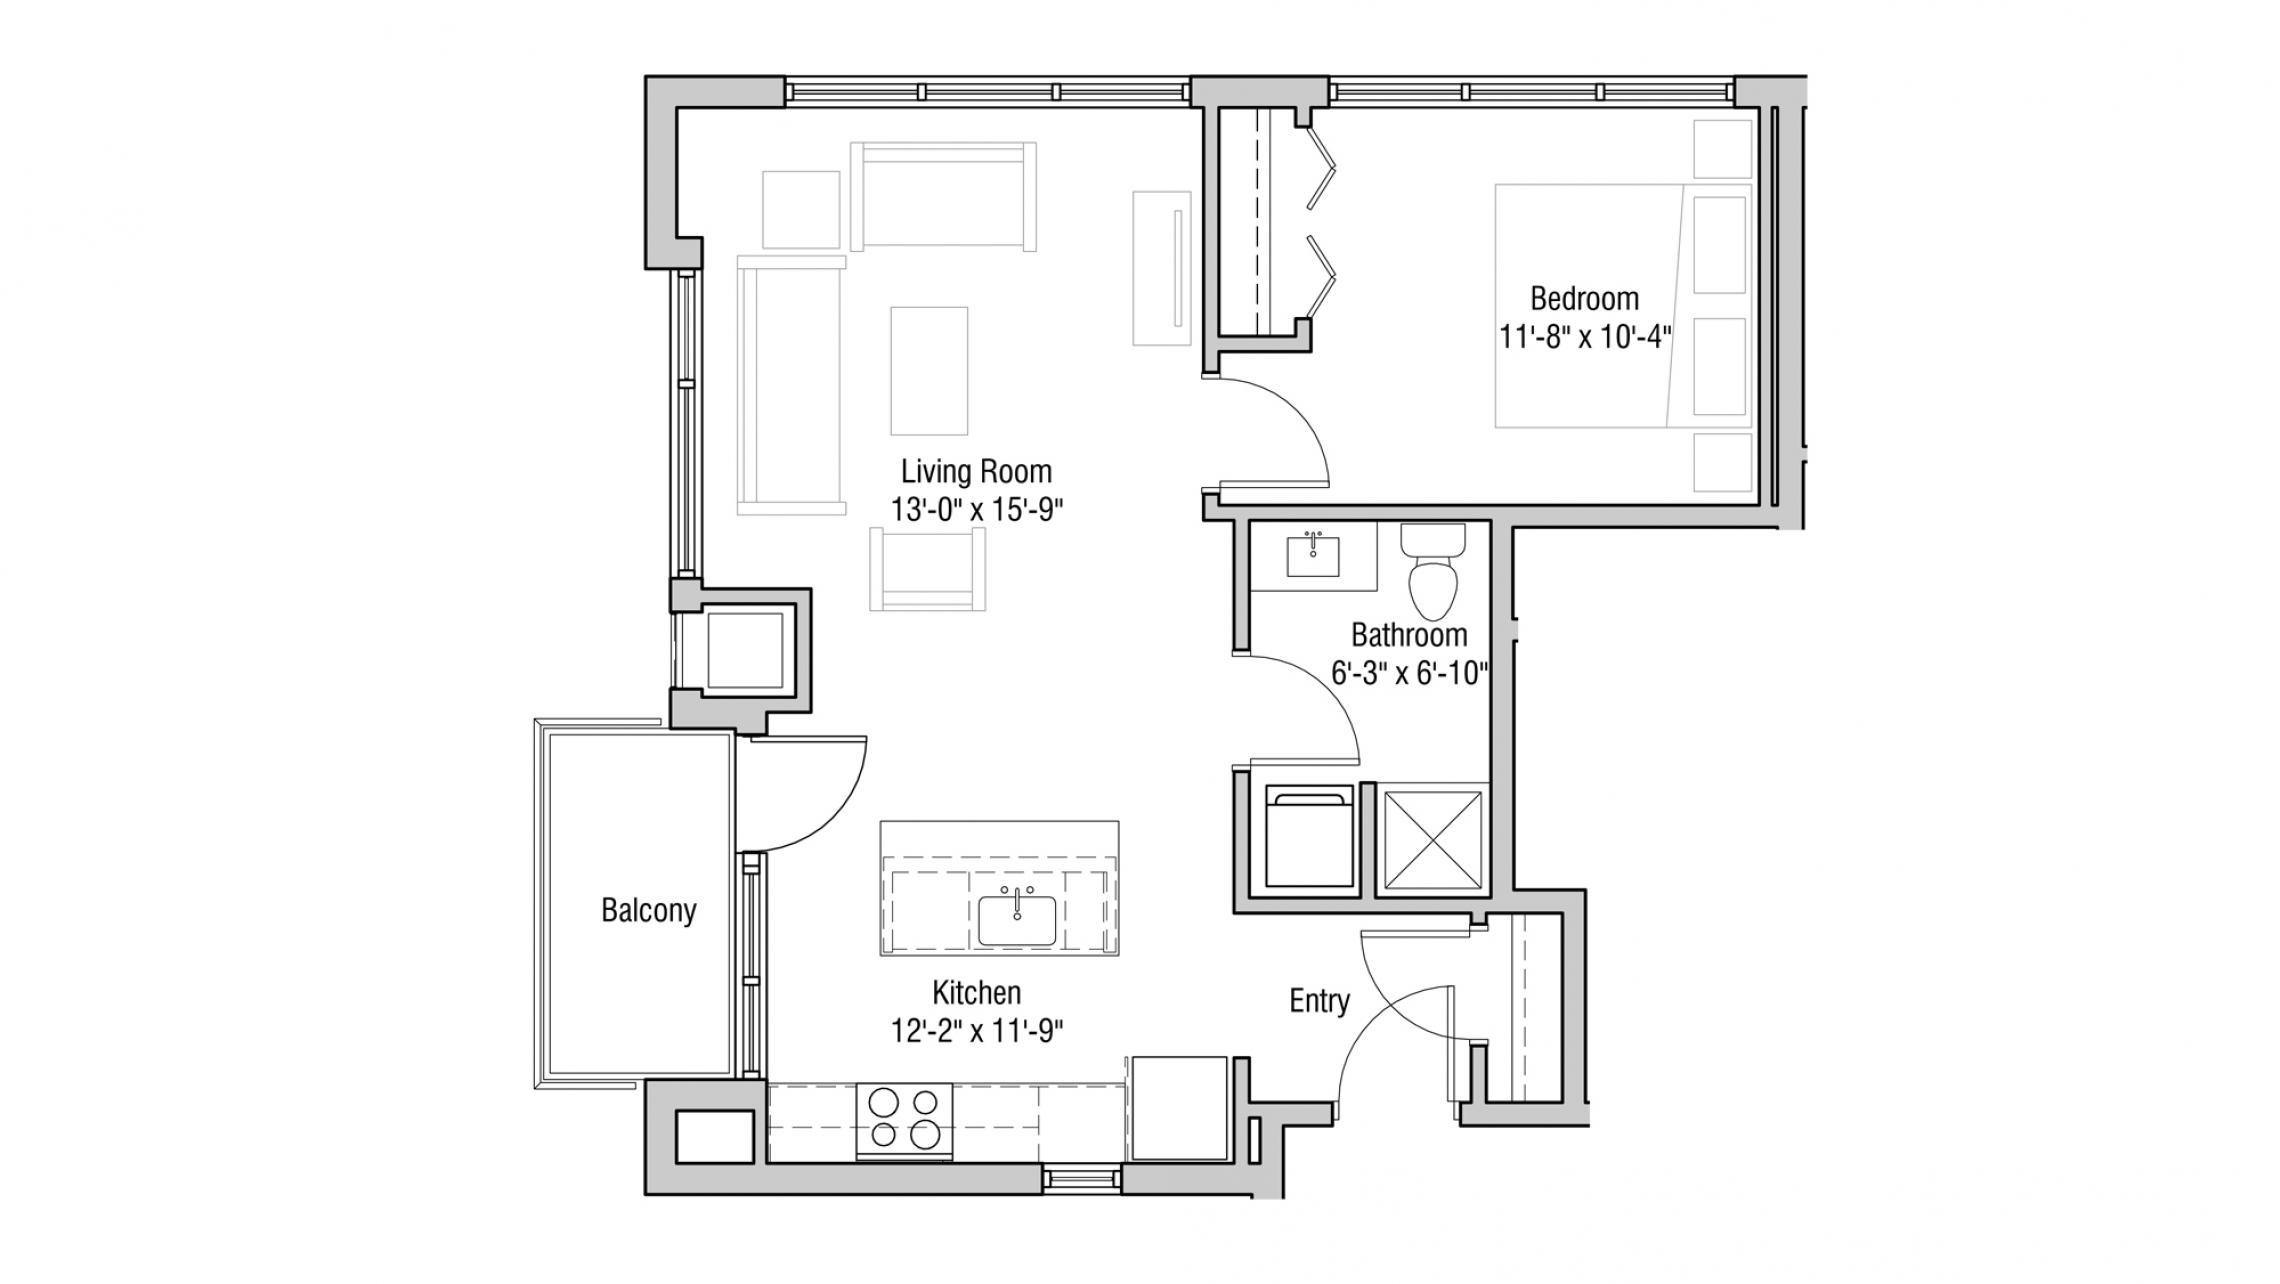 ULI Quarter Row 427 - One Bedroom, One Bathroom